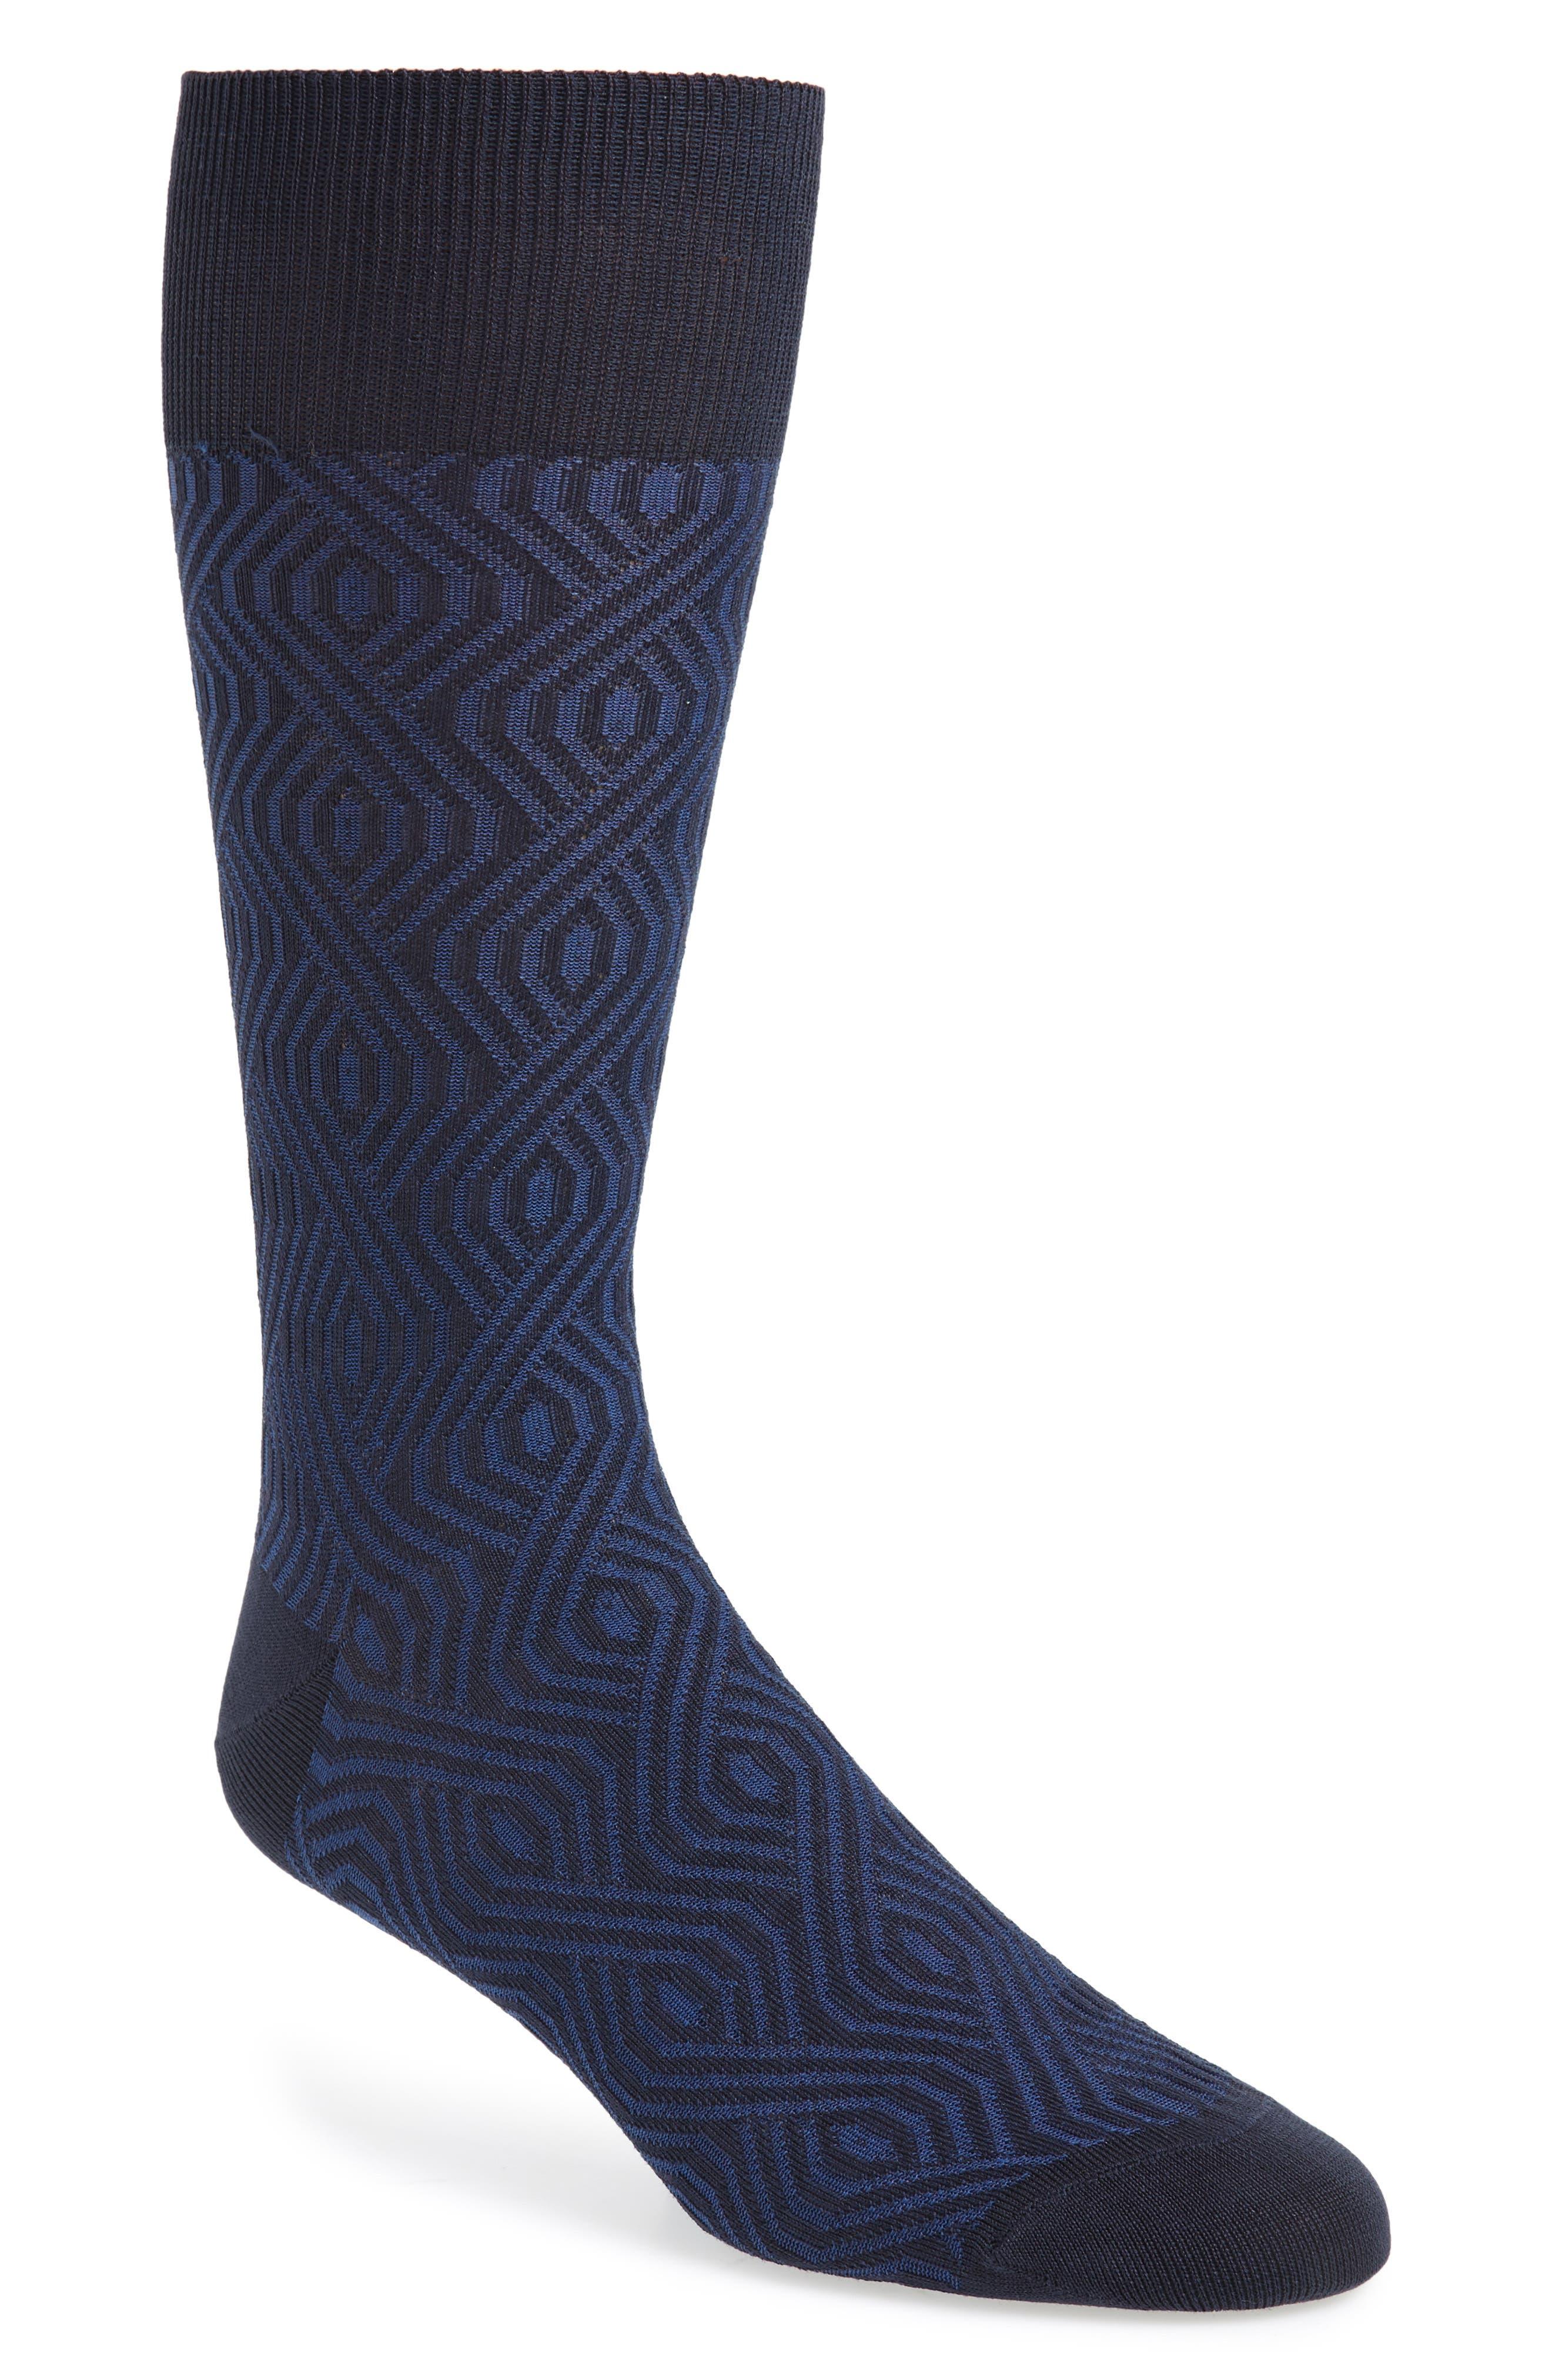 Geometric Socks,                             Main thumbnail 1, color,                             410